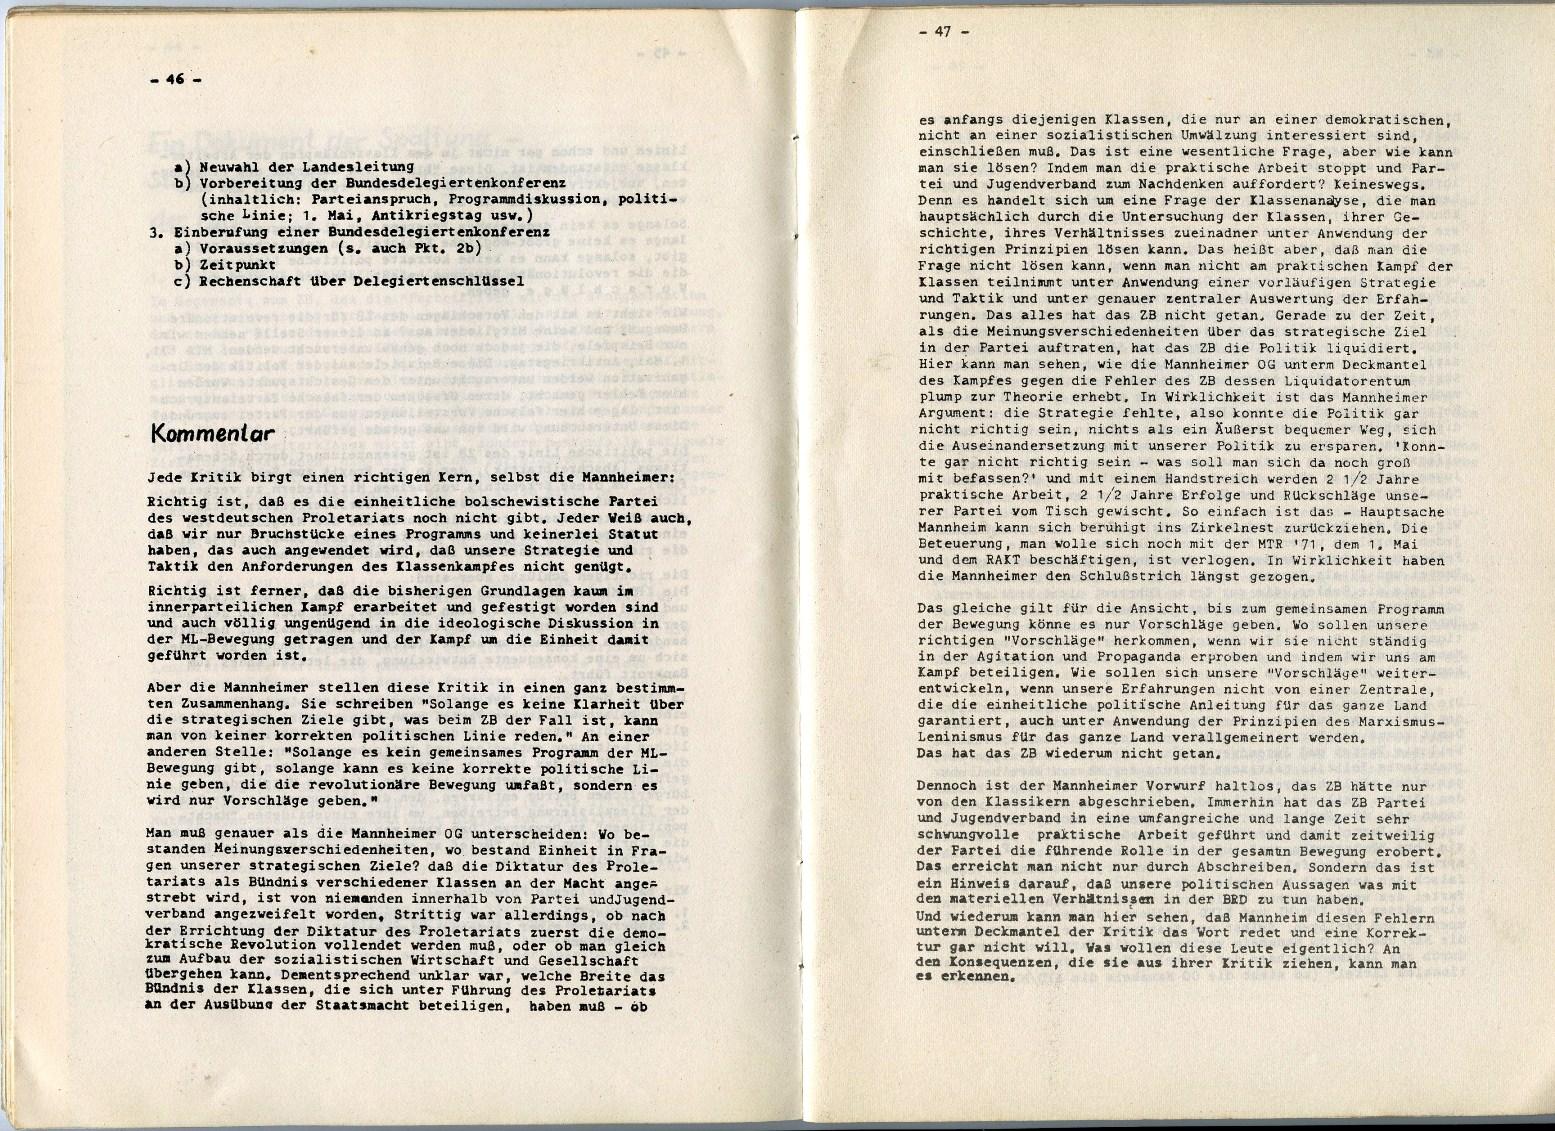 ZB_Universitas_1972_27